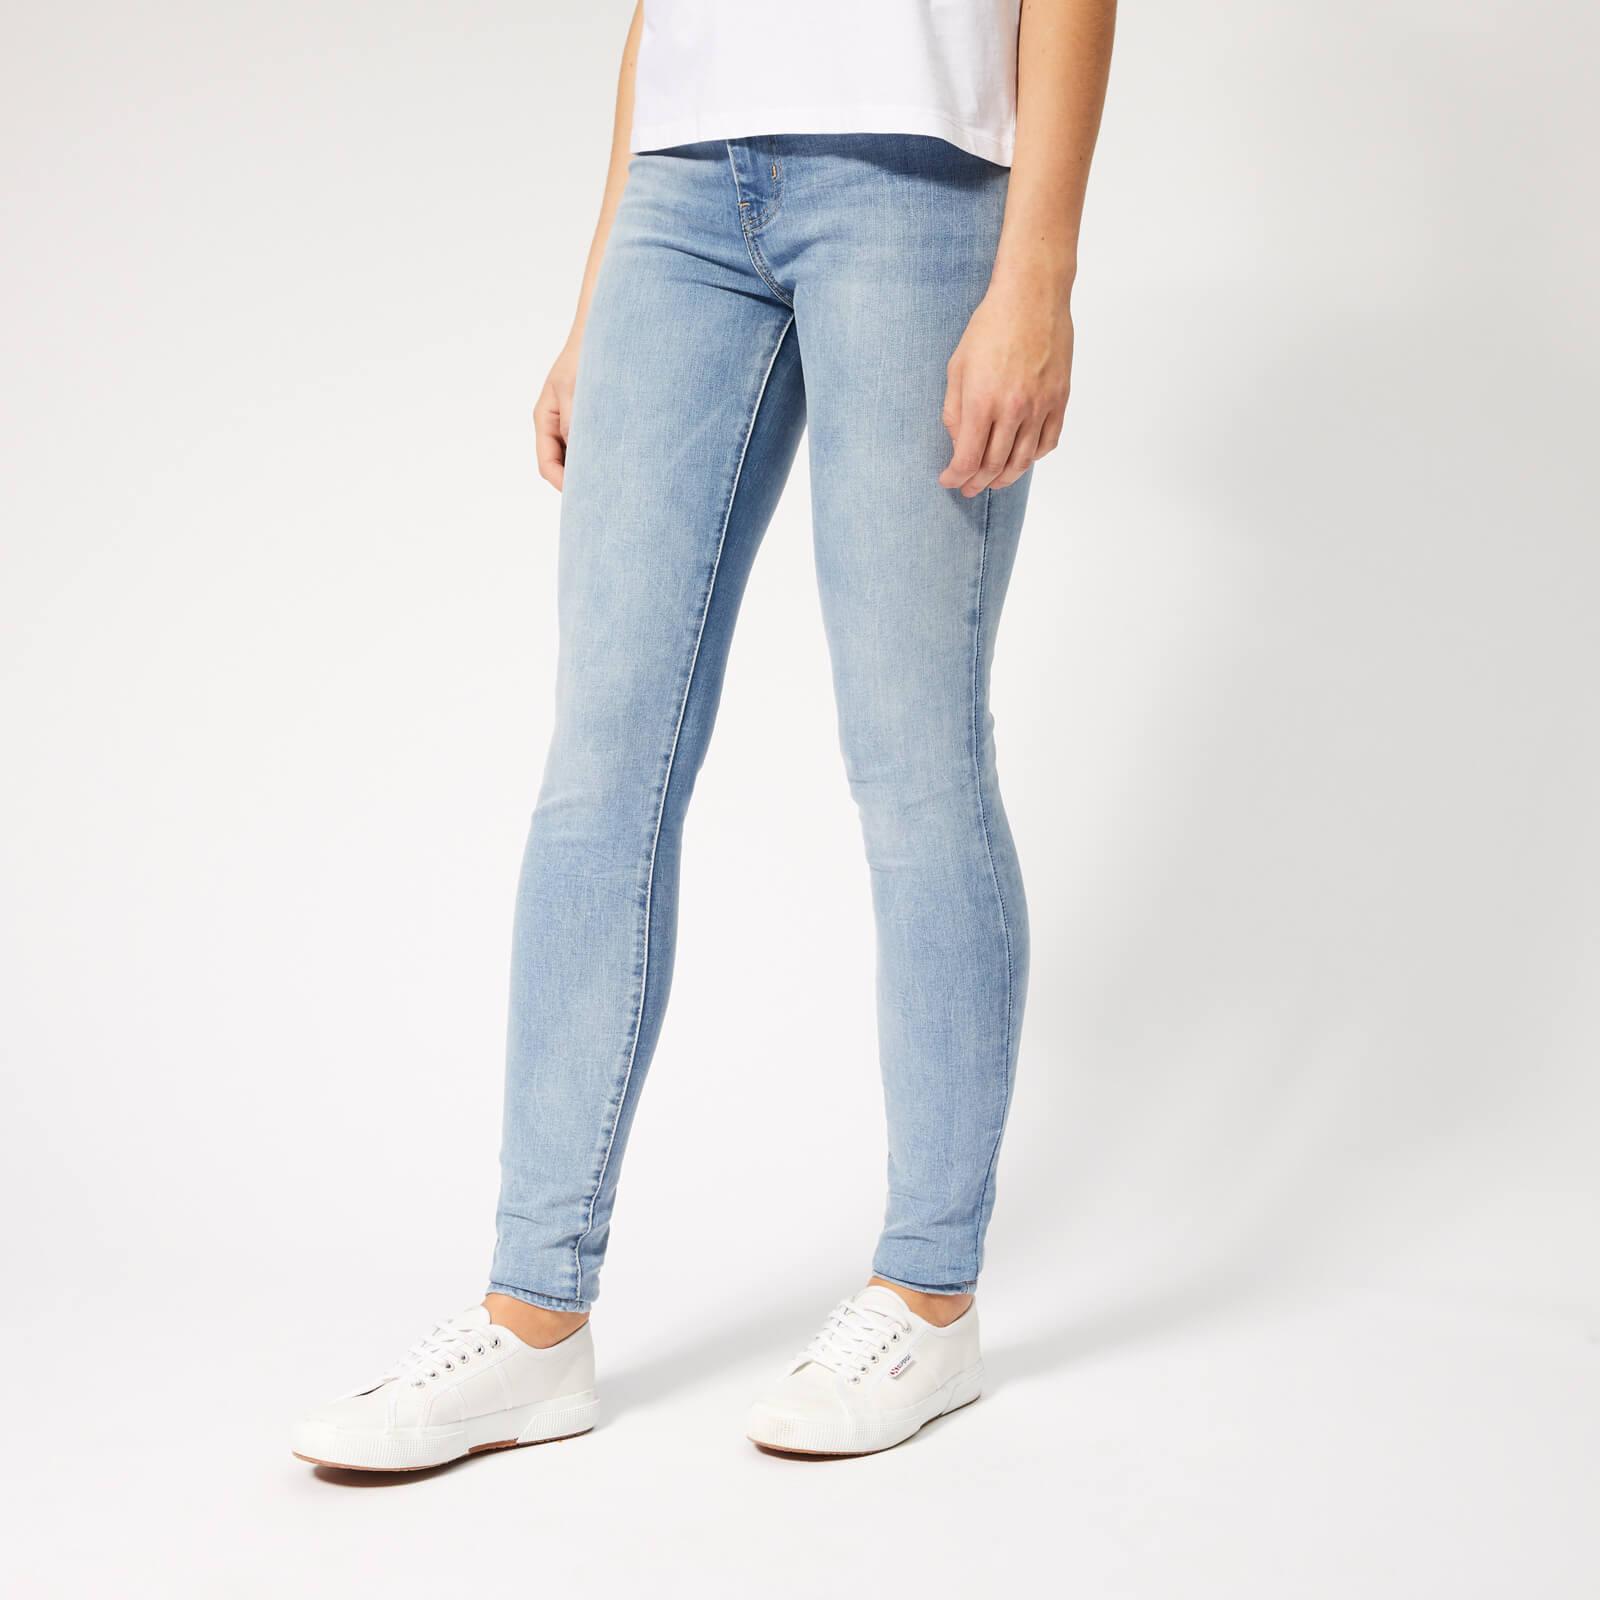 59941d0b Levi's Women's Mile High Super Skinny Jeans - You Got Me Clothing |  TheHut.com